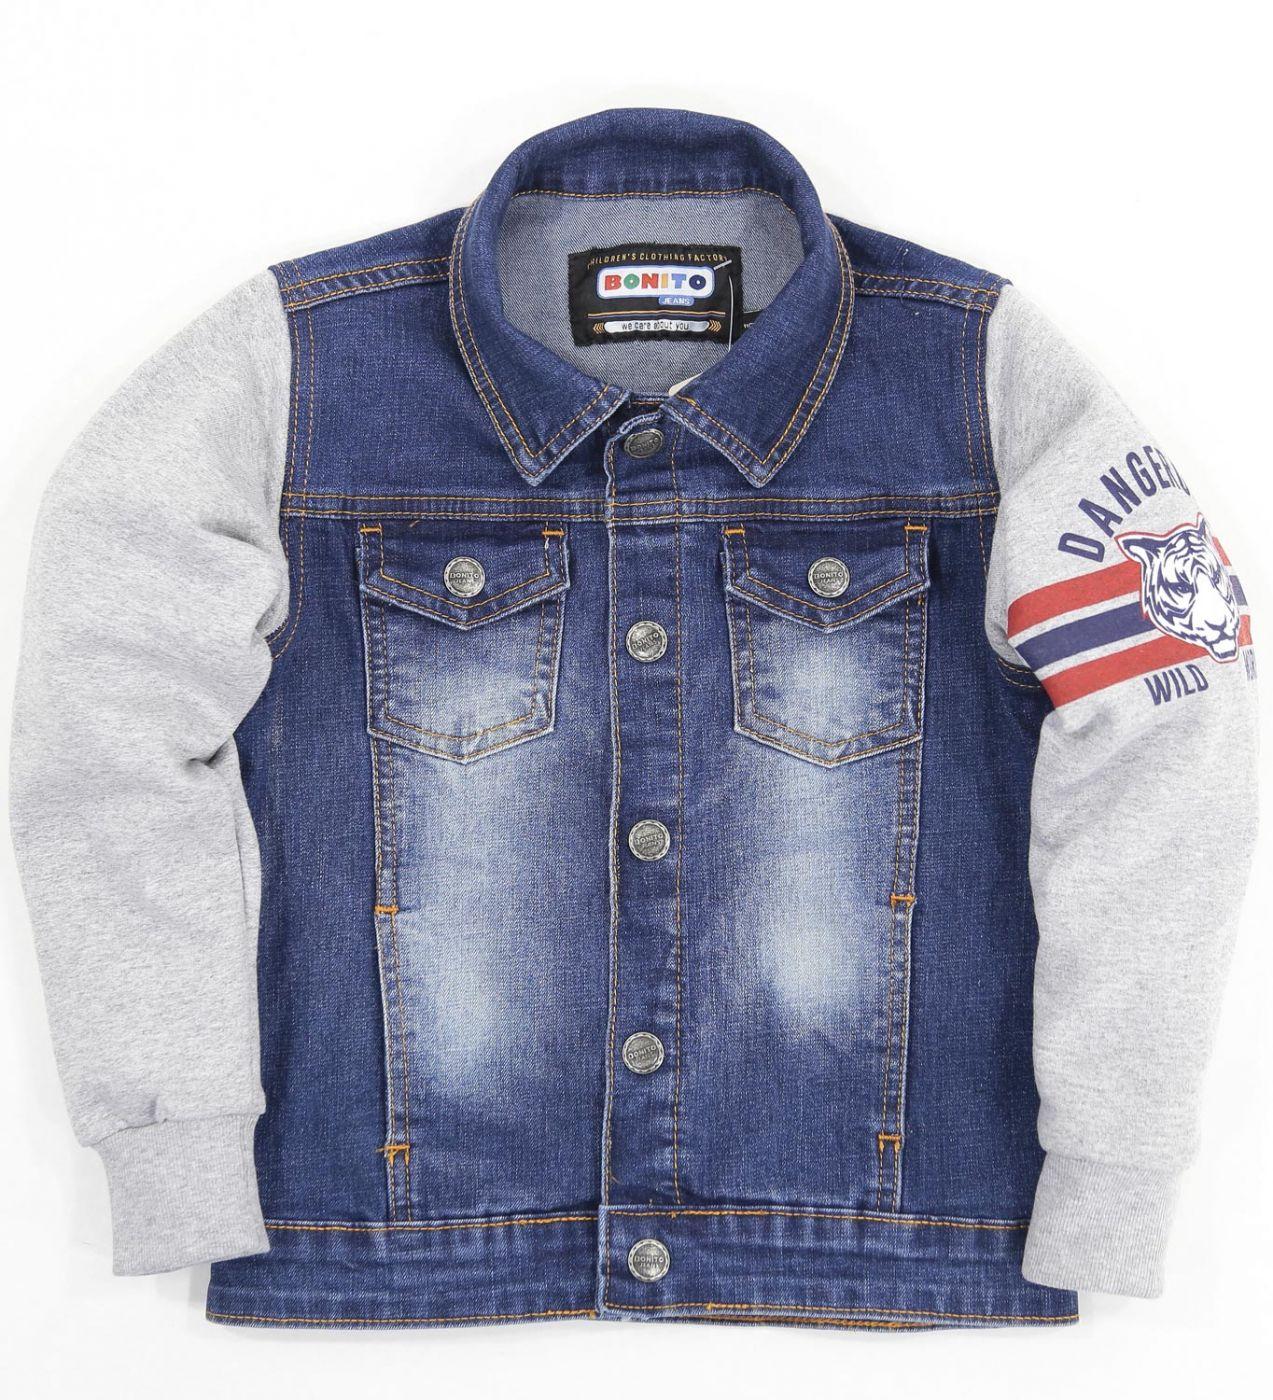 Джинсовый куртка Bonito Jeans OR760P